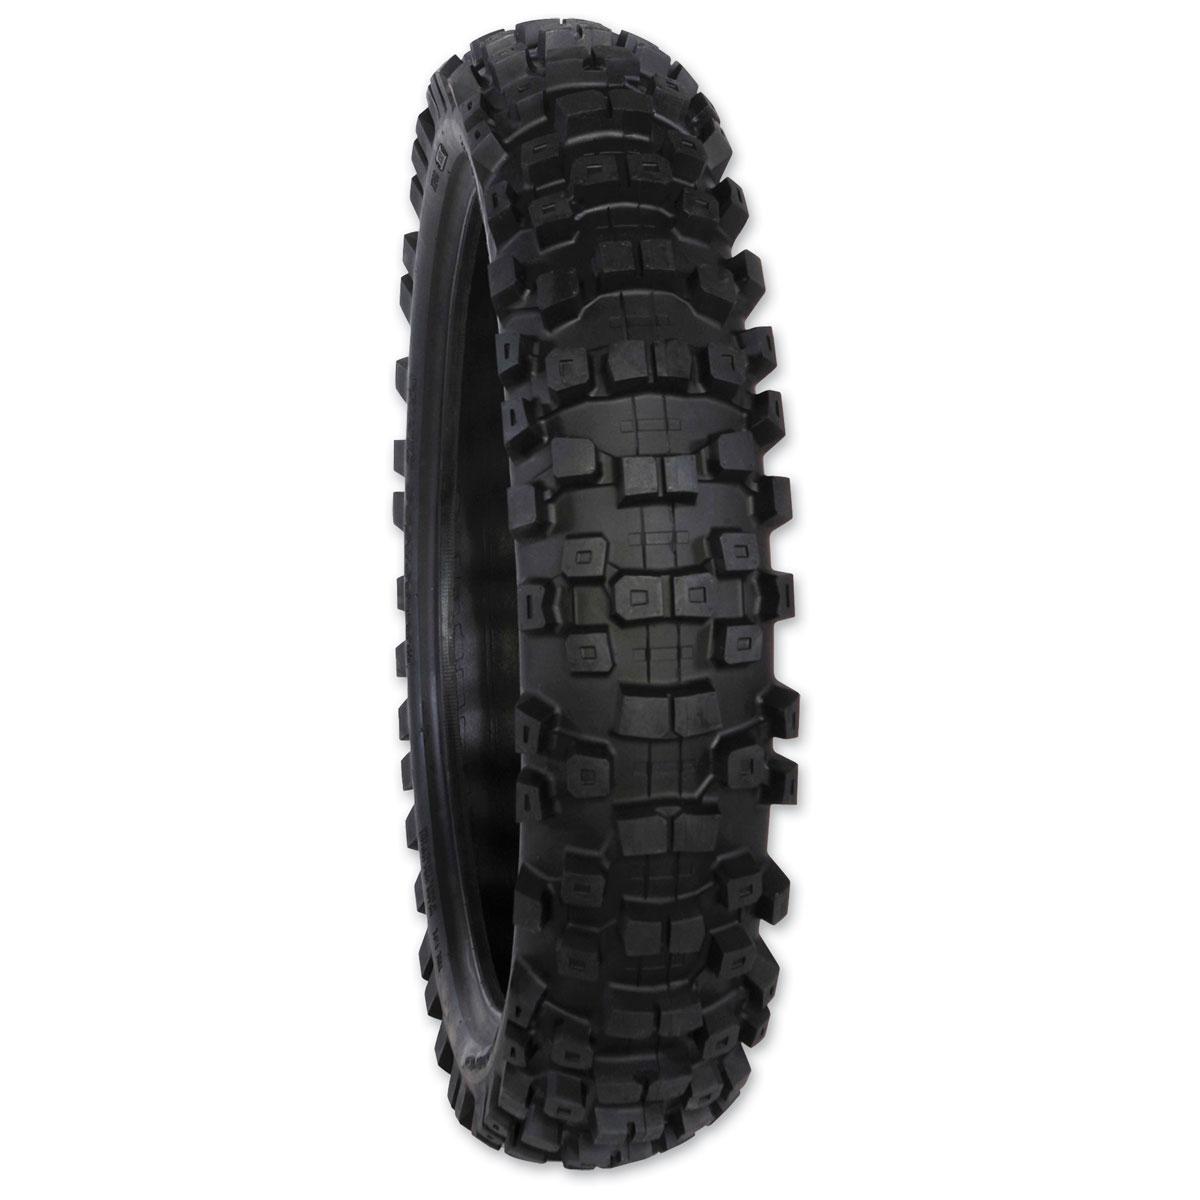 Duro DM1154 110/100-18 Rear Tire